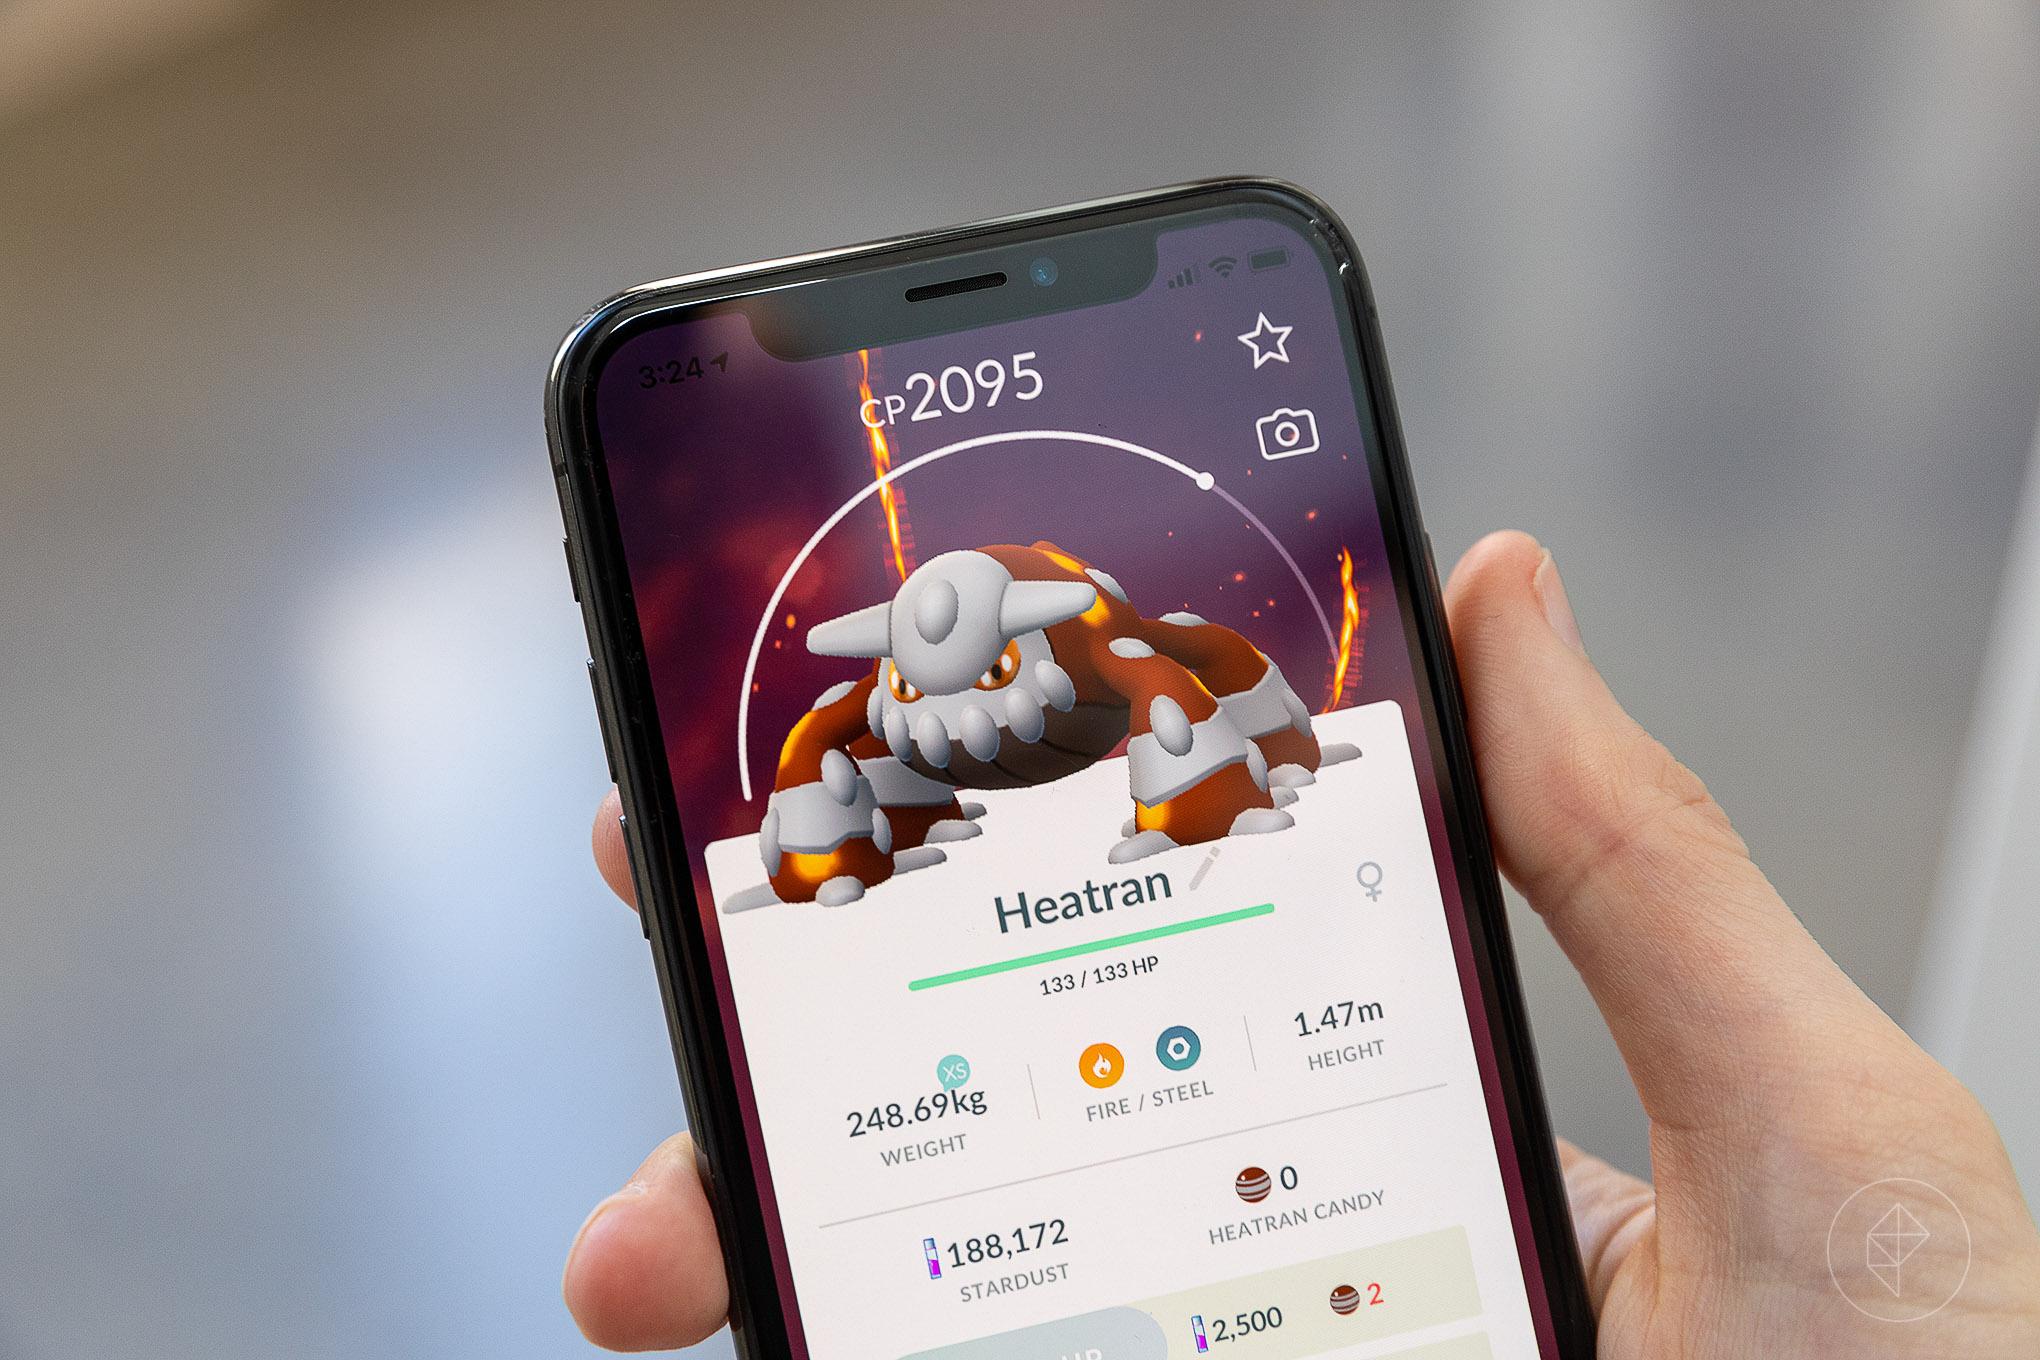 Heatran in Pokémon Go